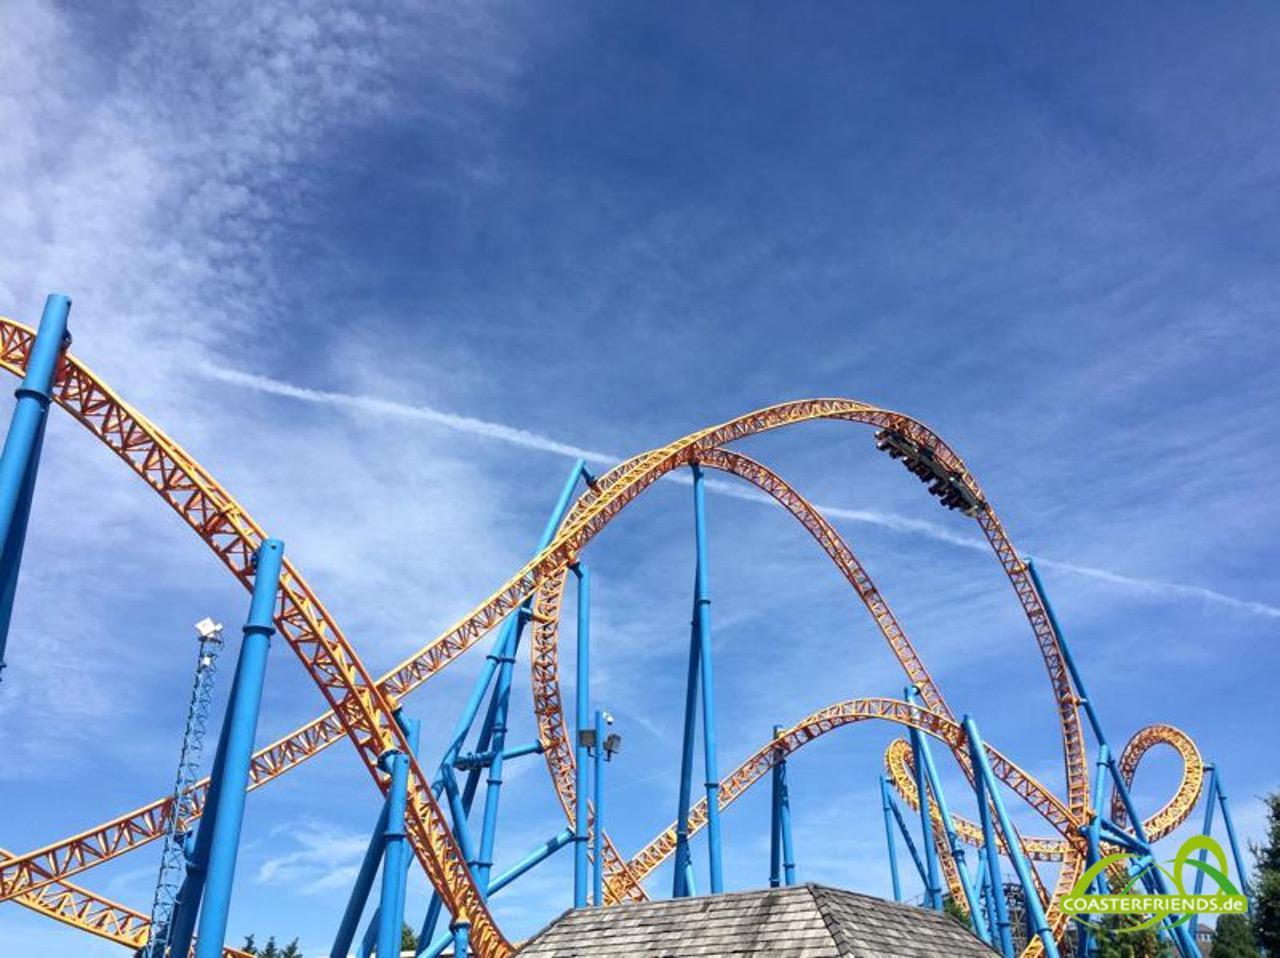 Nordamerika - https://coasterfriends.de/joomla//images/pcp_parkdetails/nordamerika/o1212_hersheypark/content3.jpg